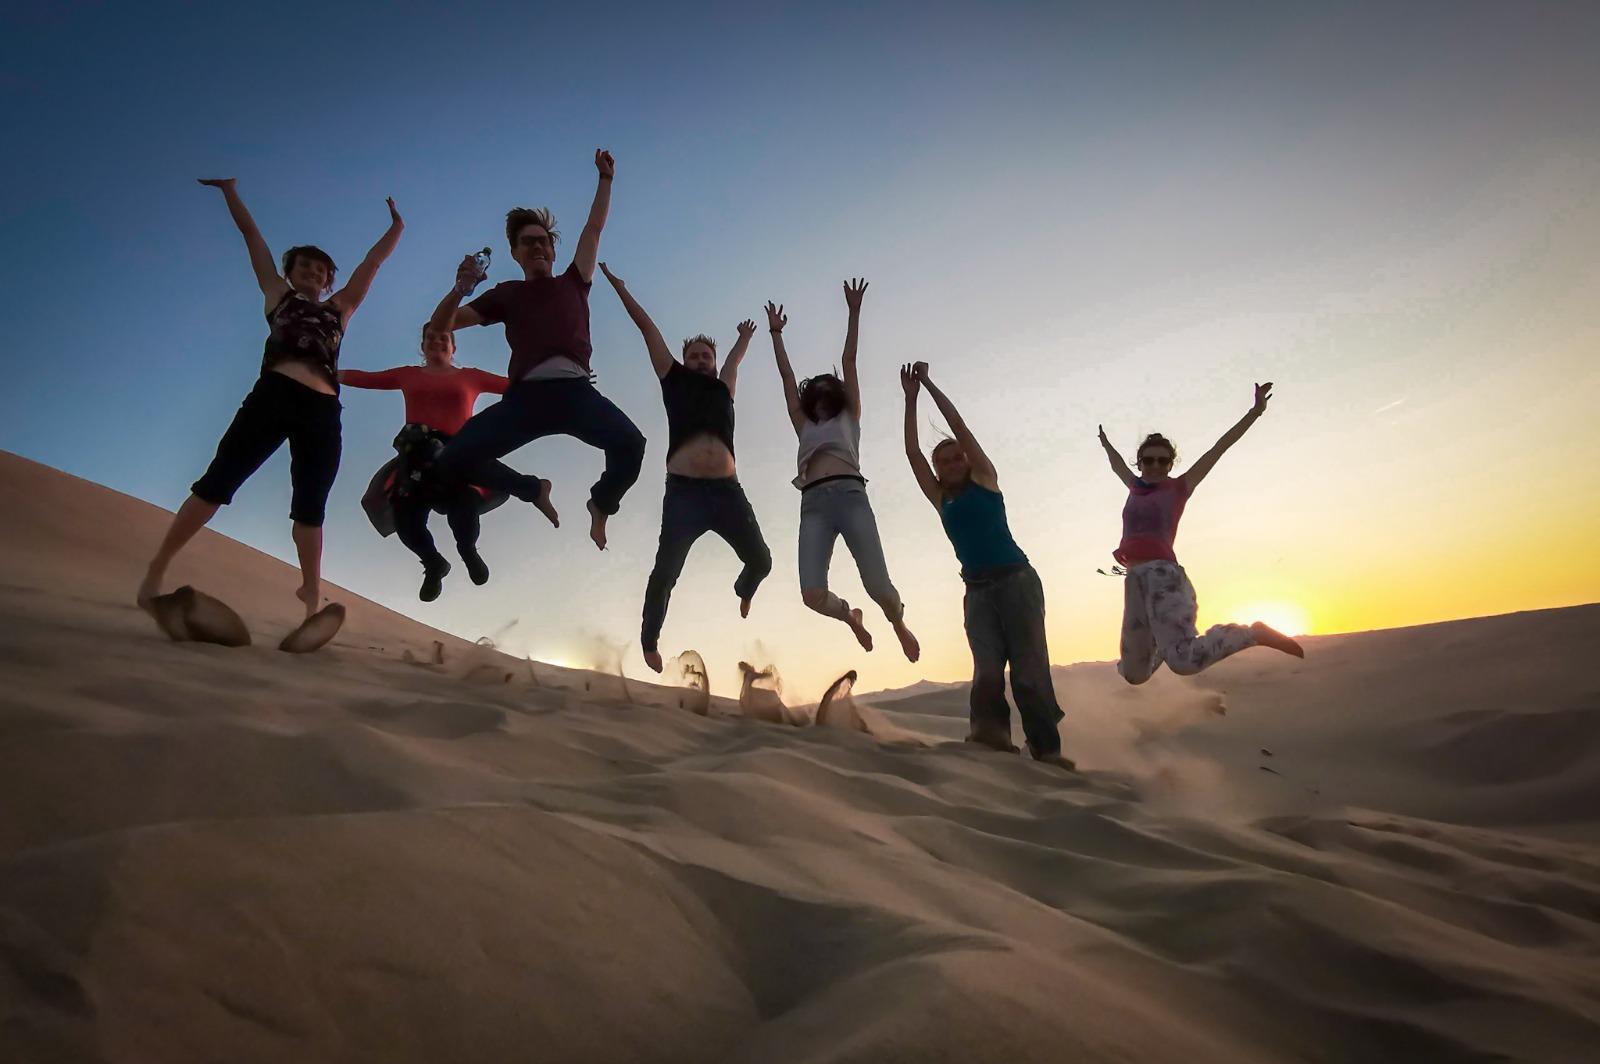 desert-jump-1